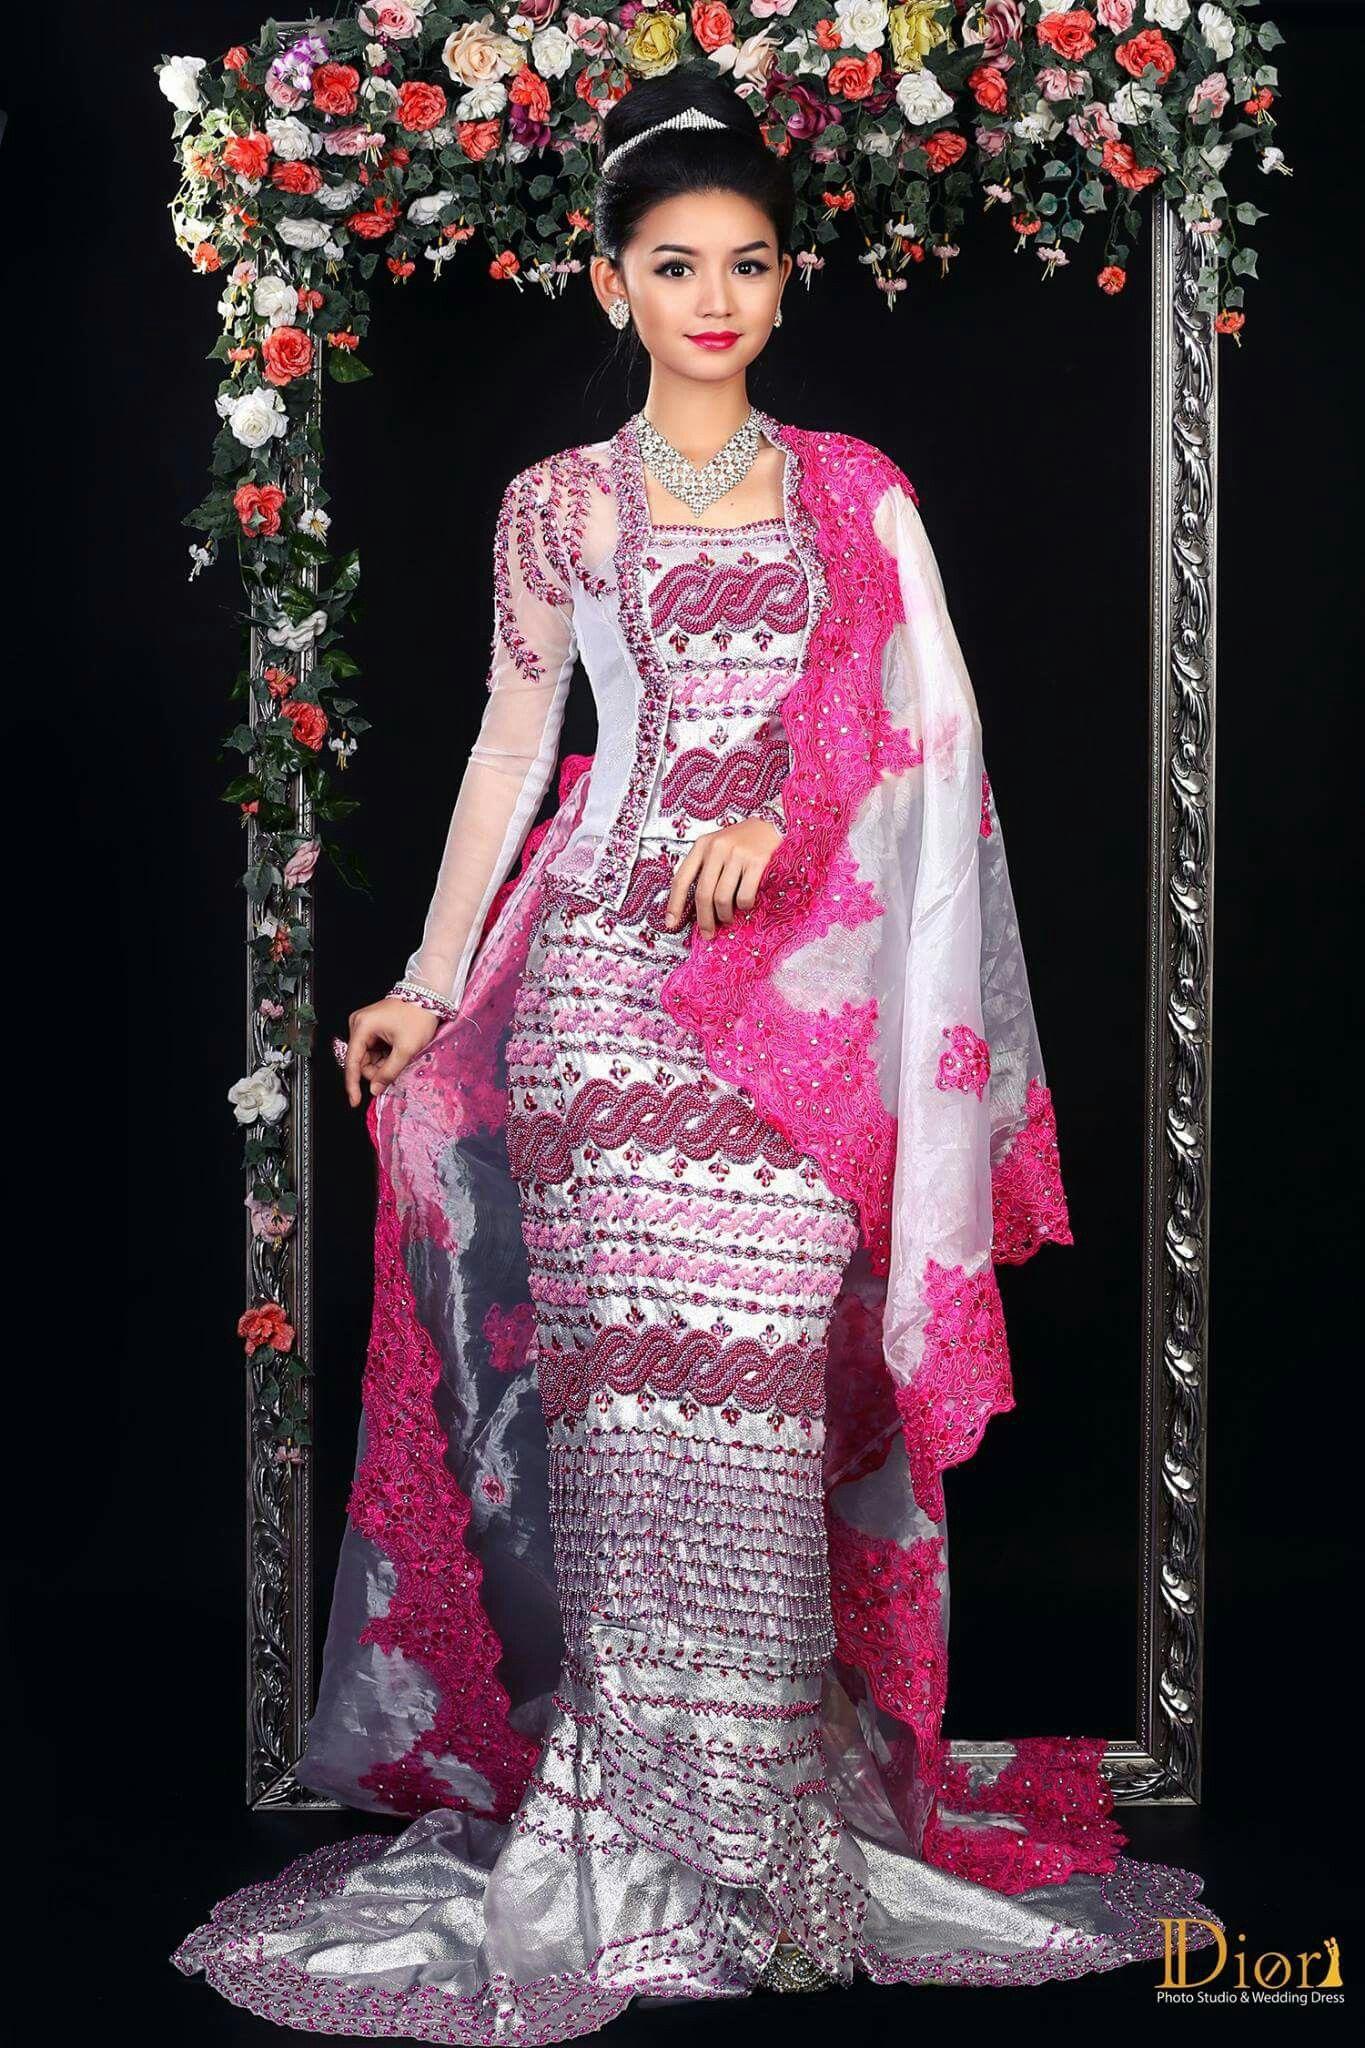 Myanmar Wedding Dress | Traditional dresses, Myanmar ...